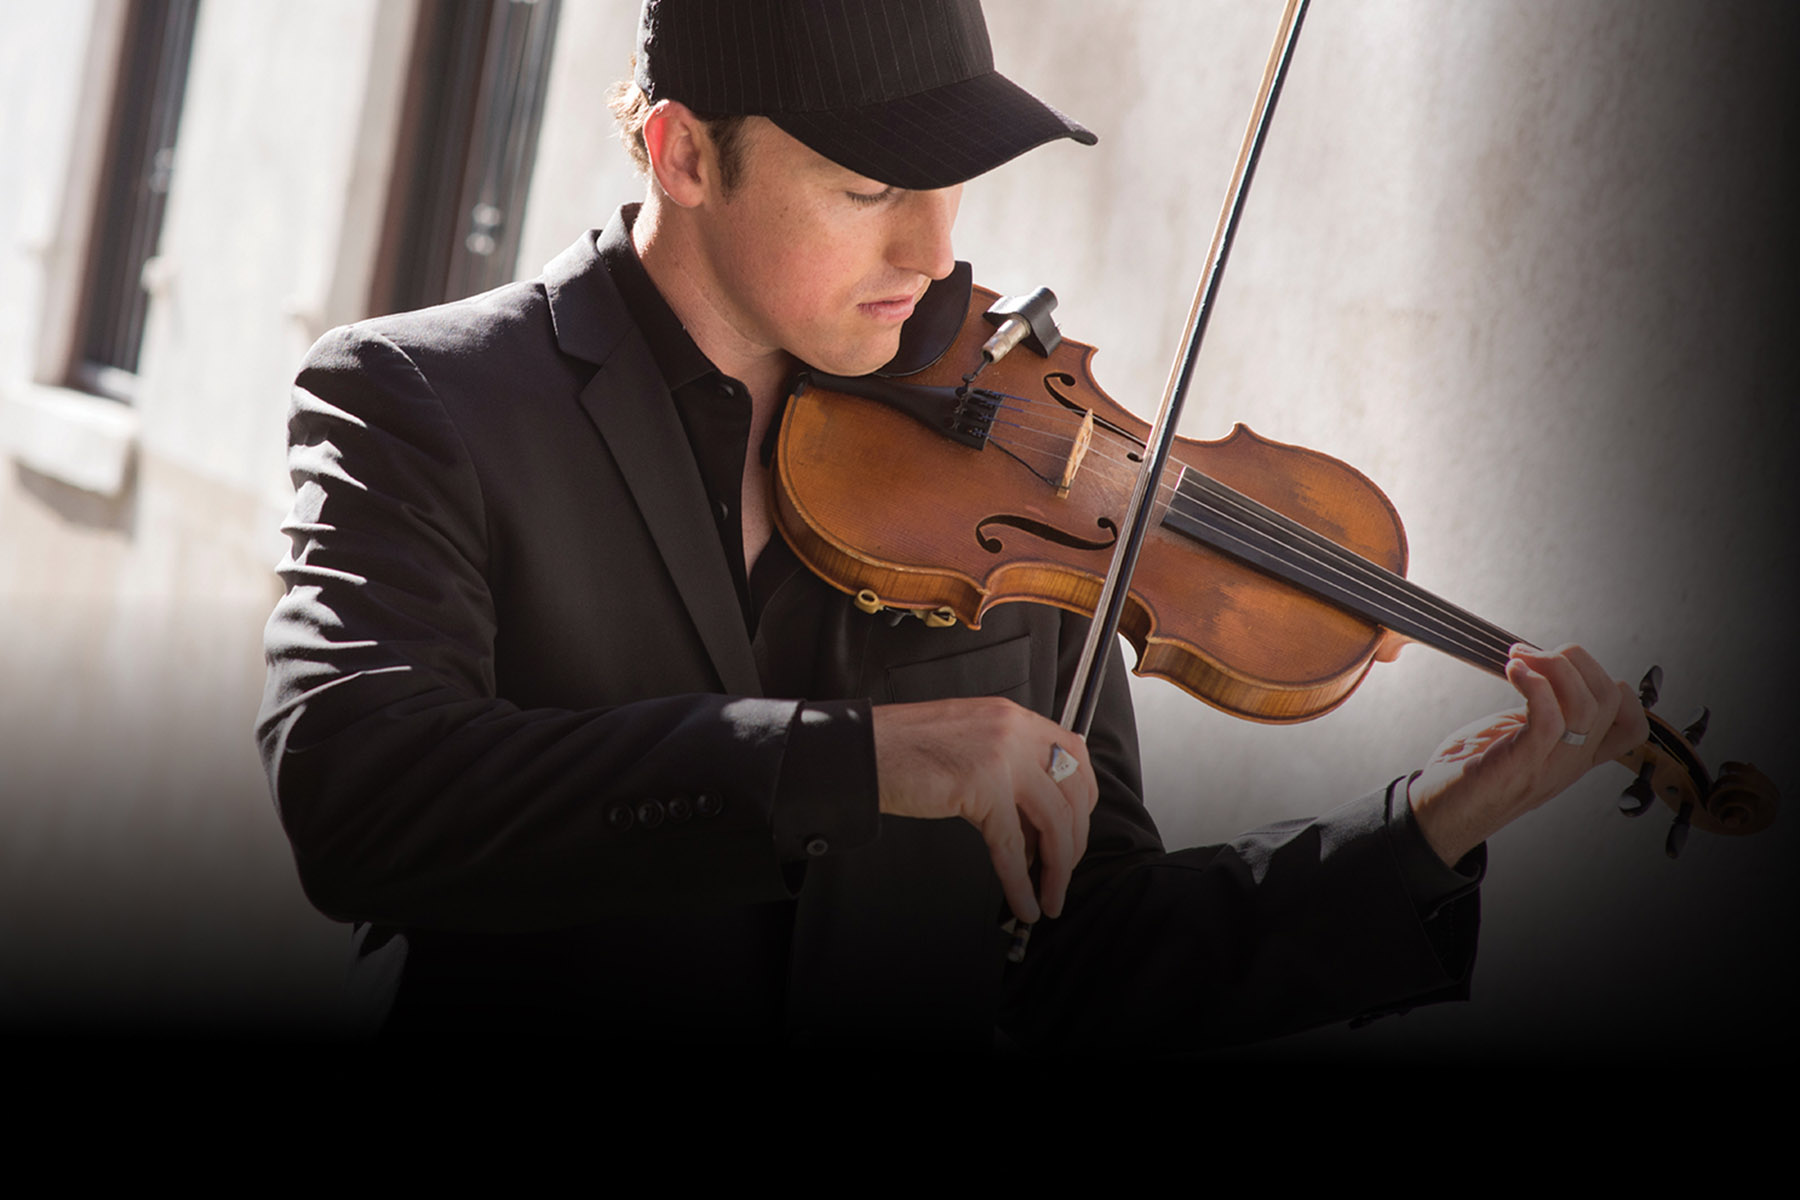 Hire Josh Vietti Violinist for Weddings